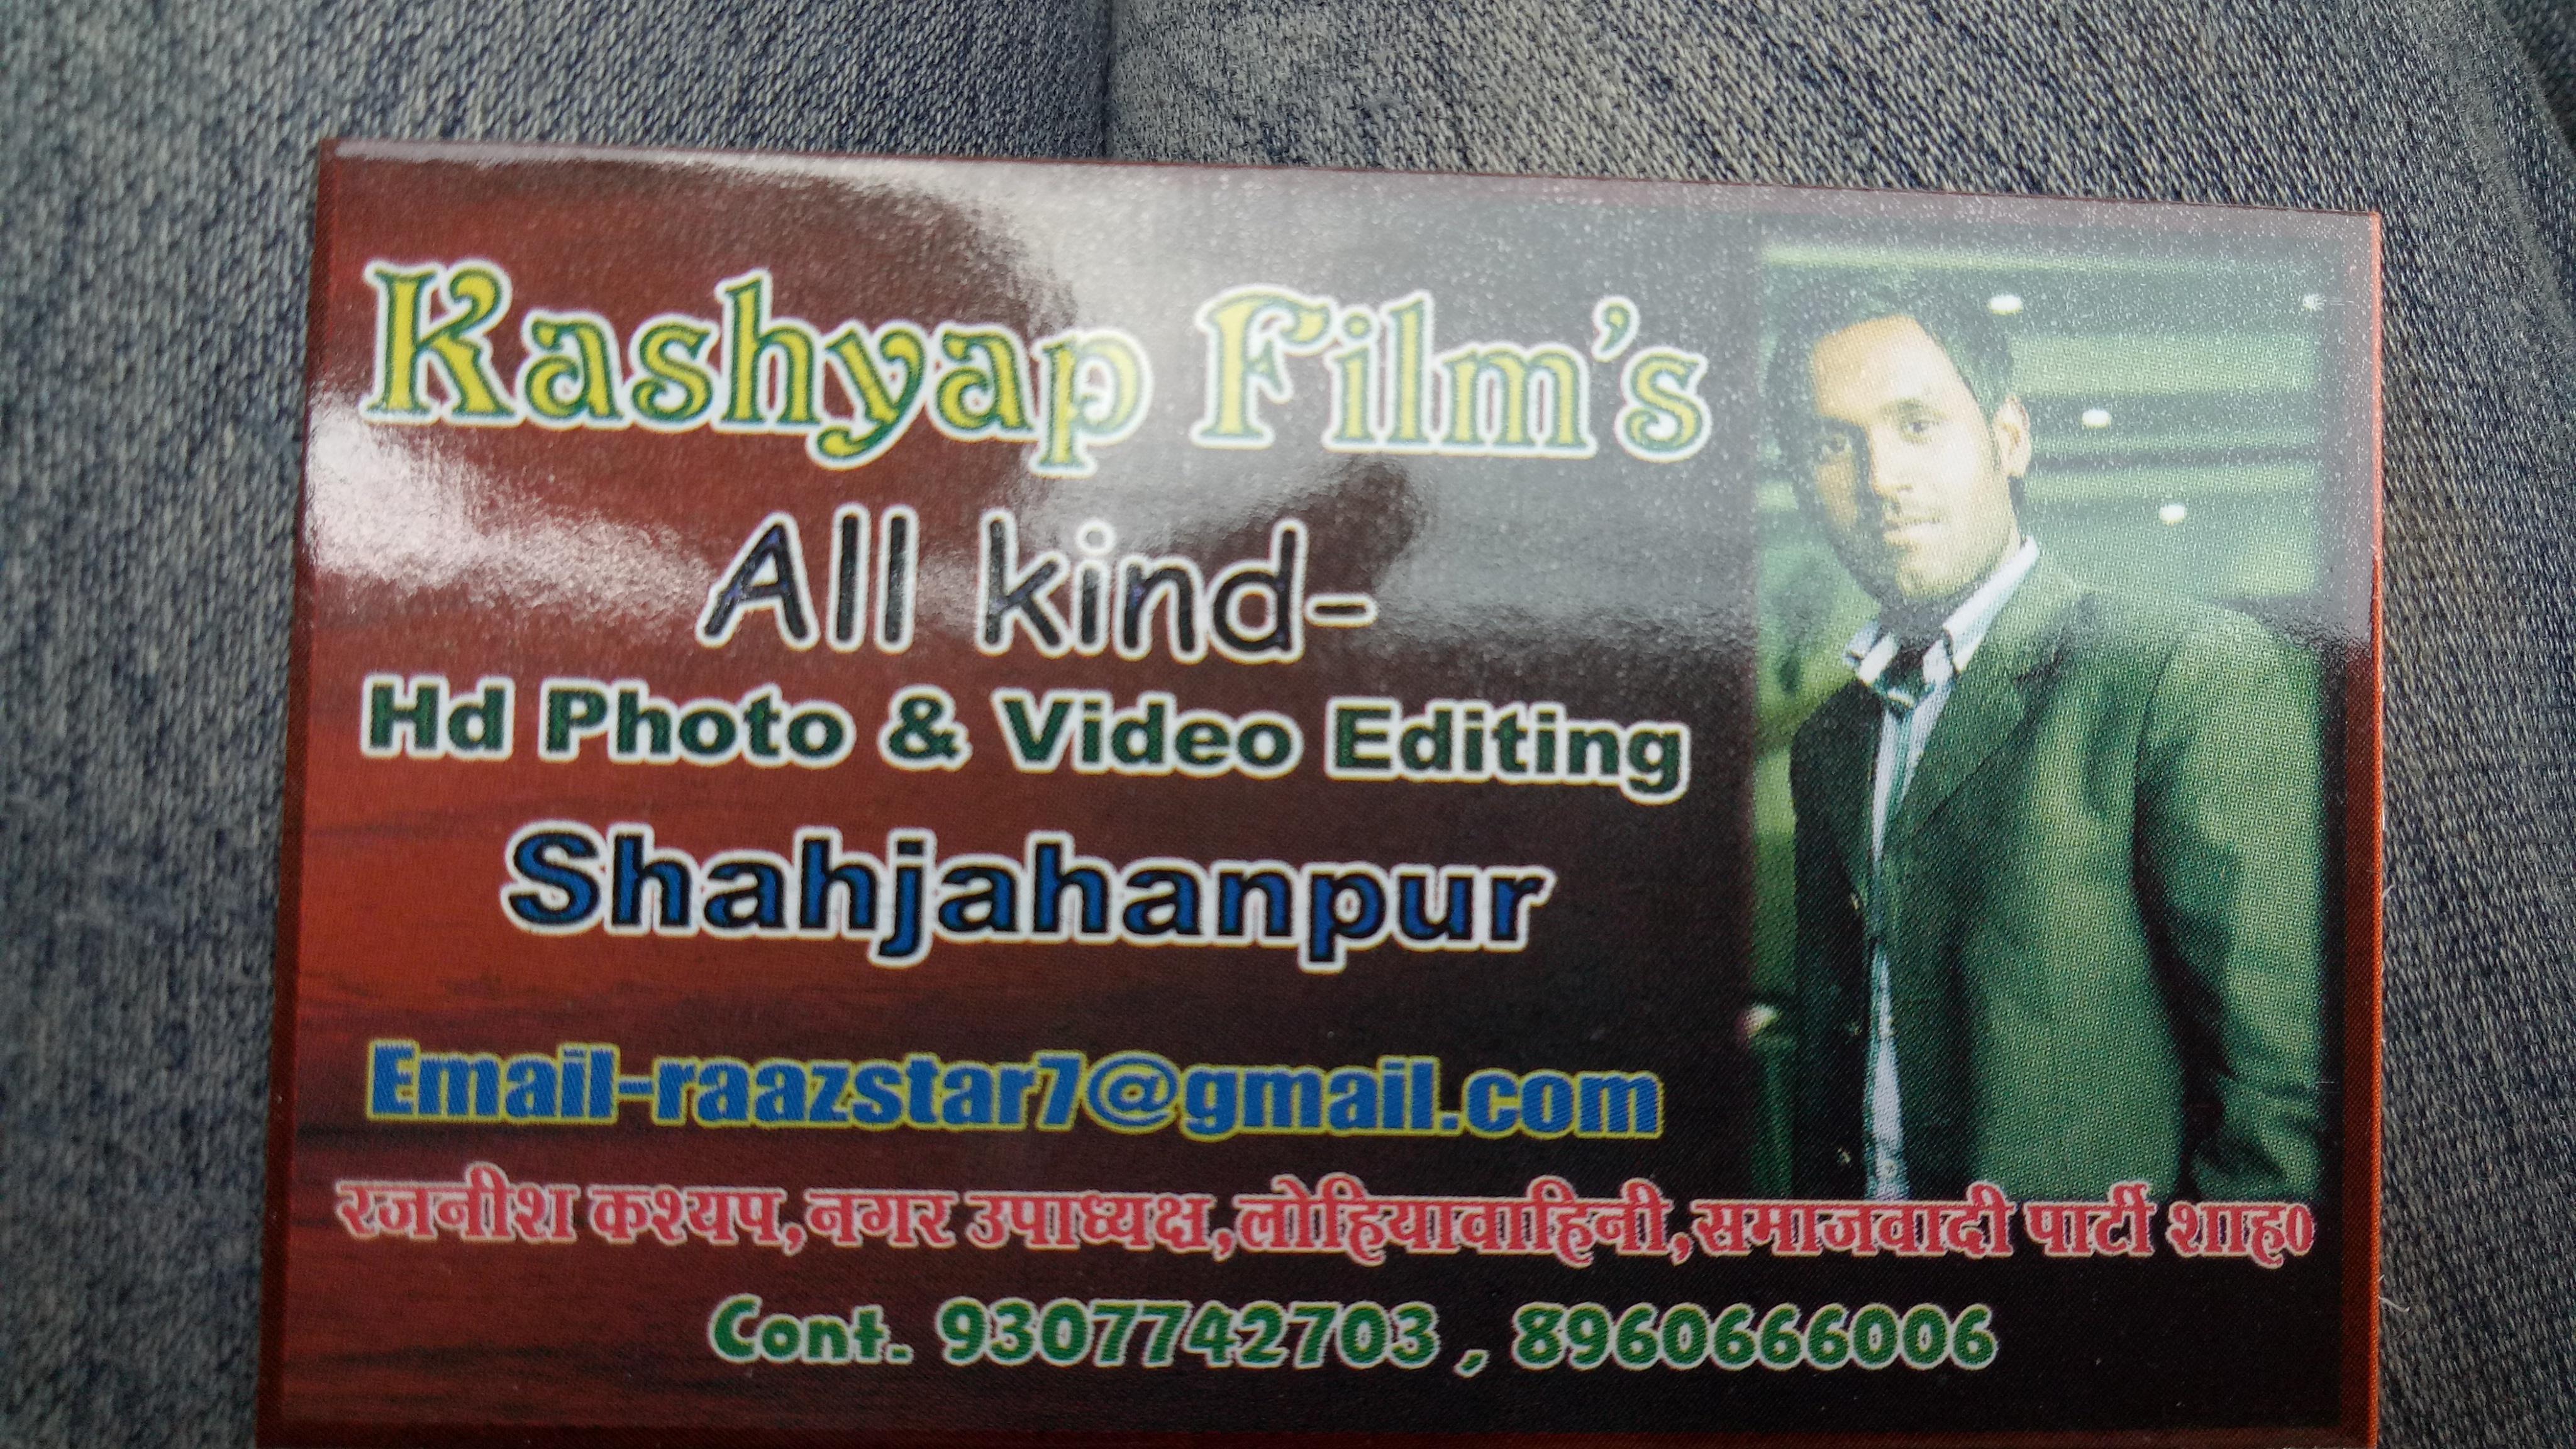 Kashyap films